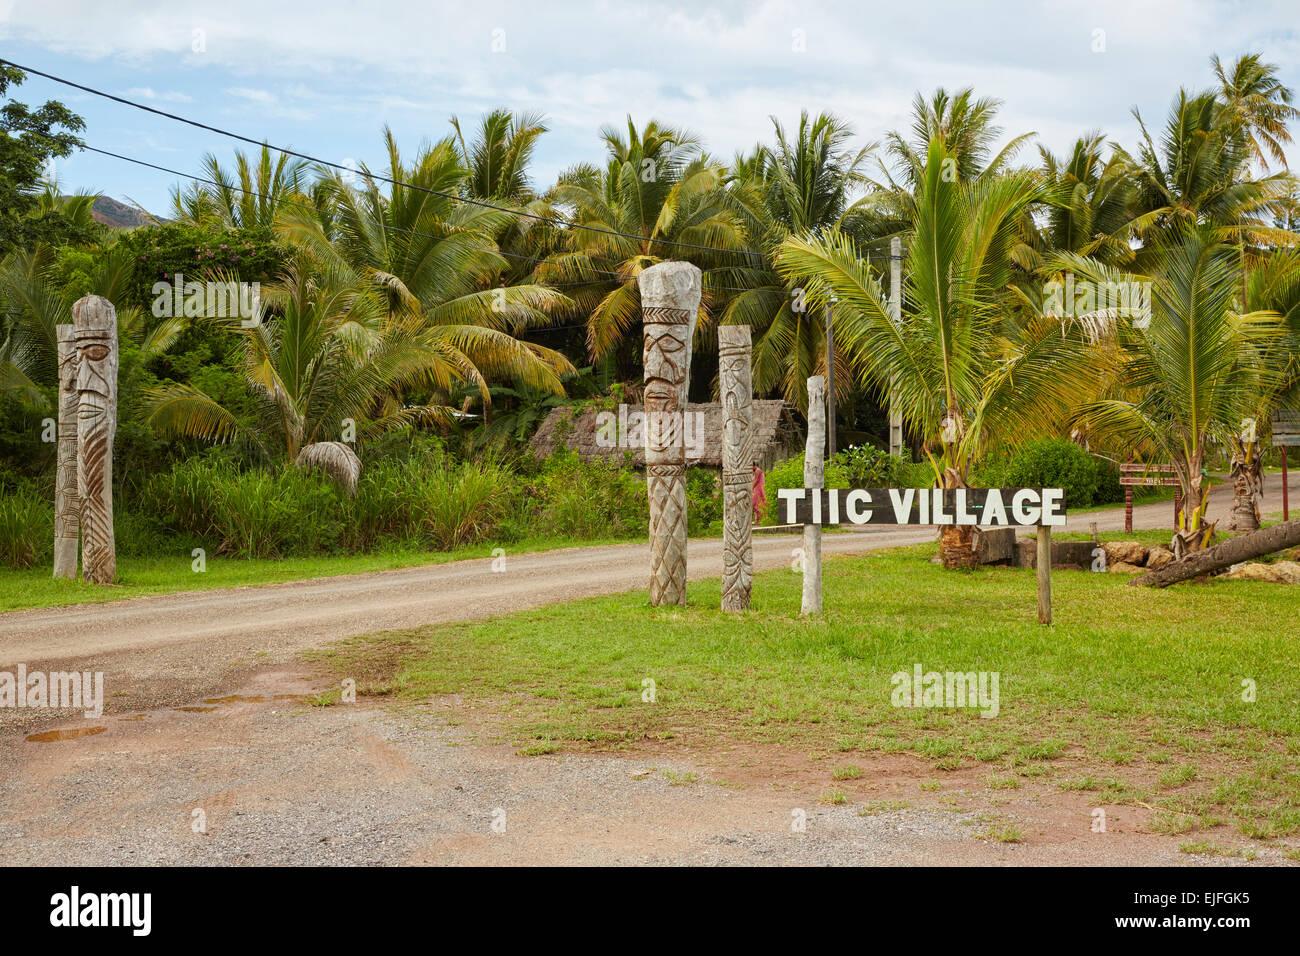 Tiic Village, New Caledonia - Stock Image